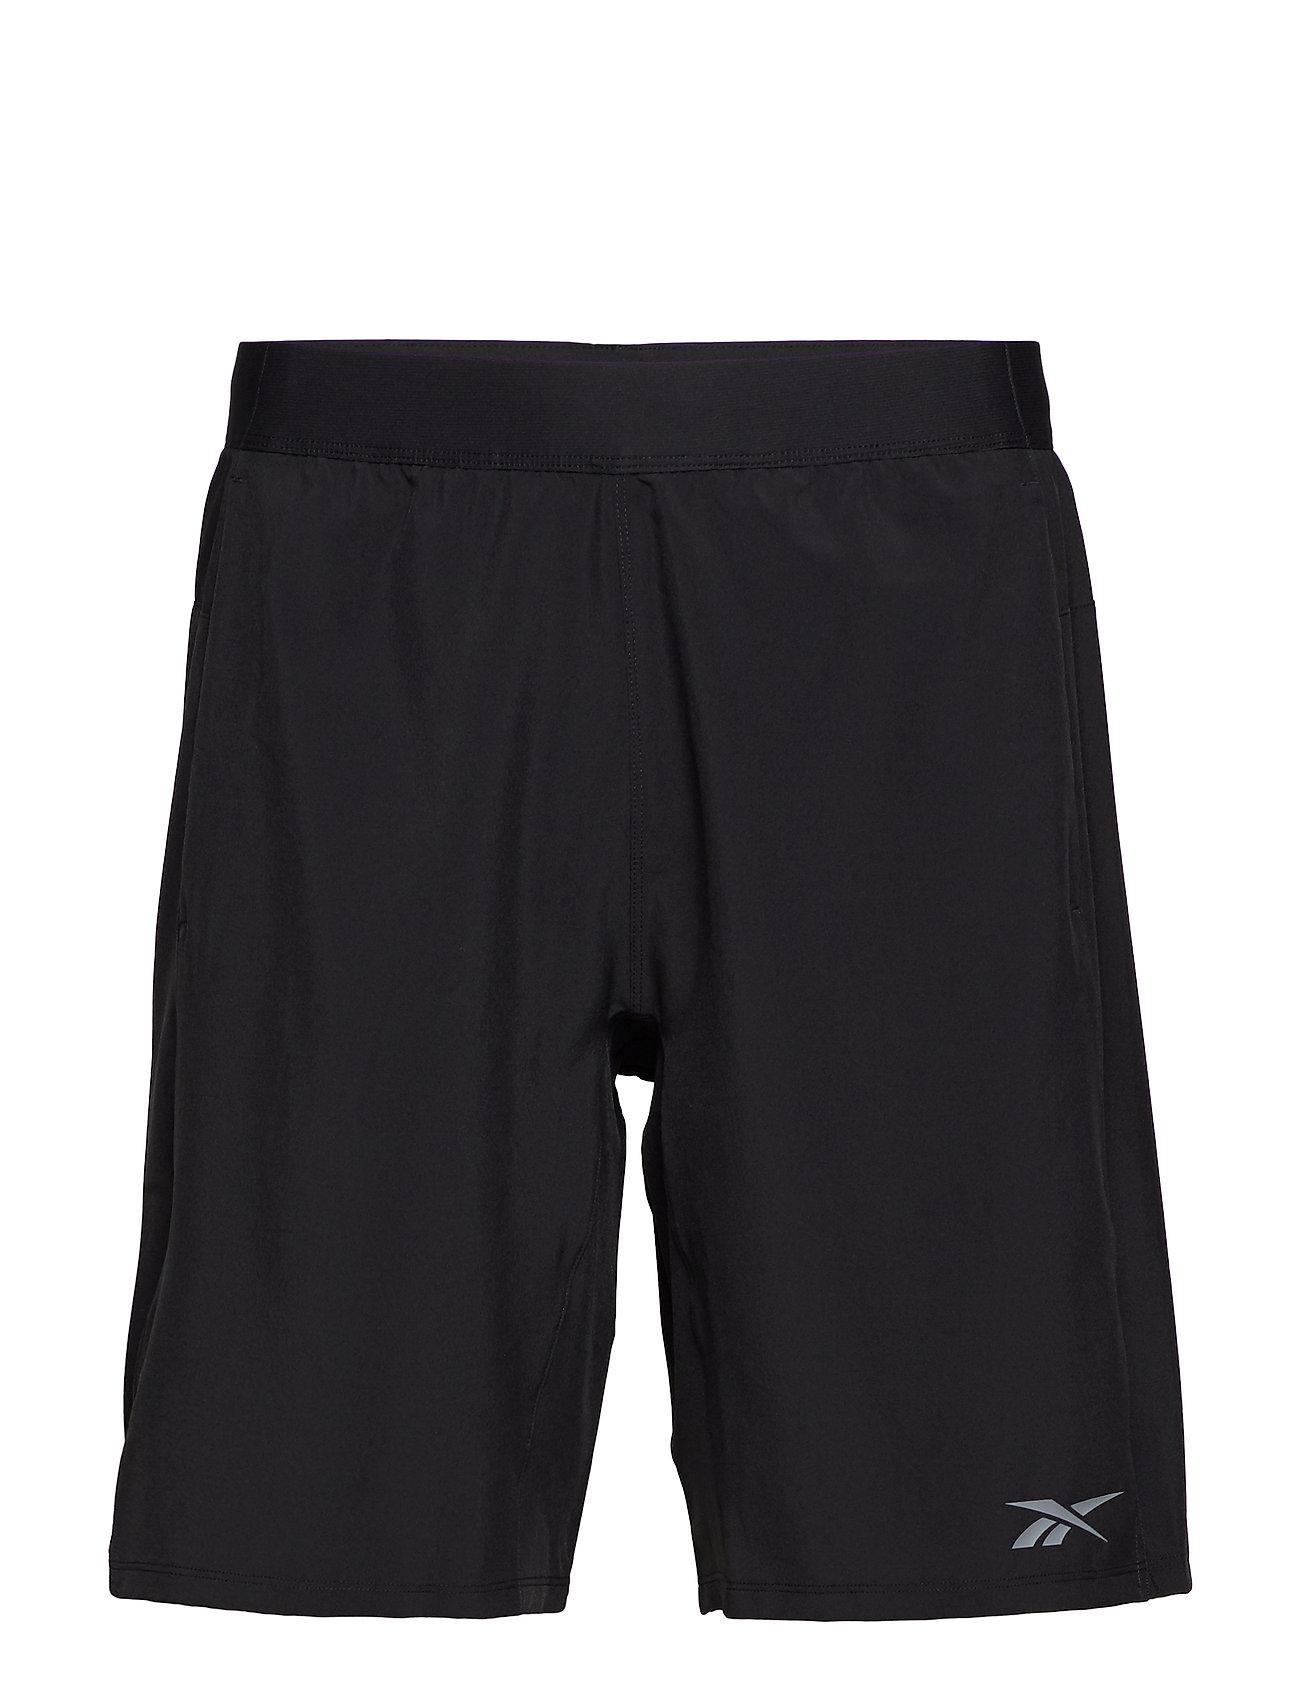 Reebok Performance Speedwick Speed Shorts - BLACK